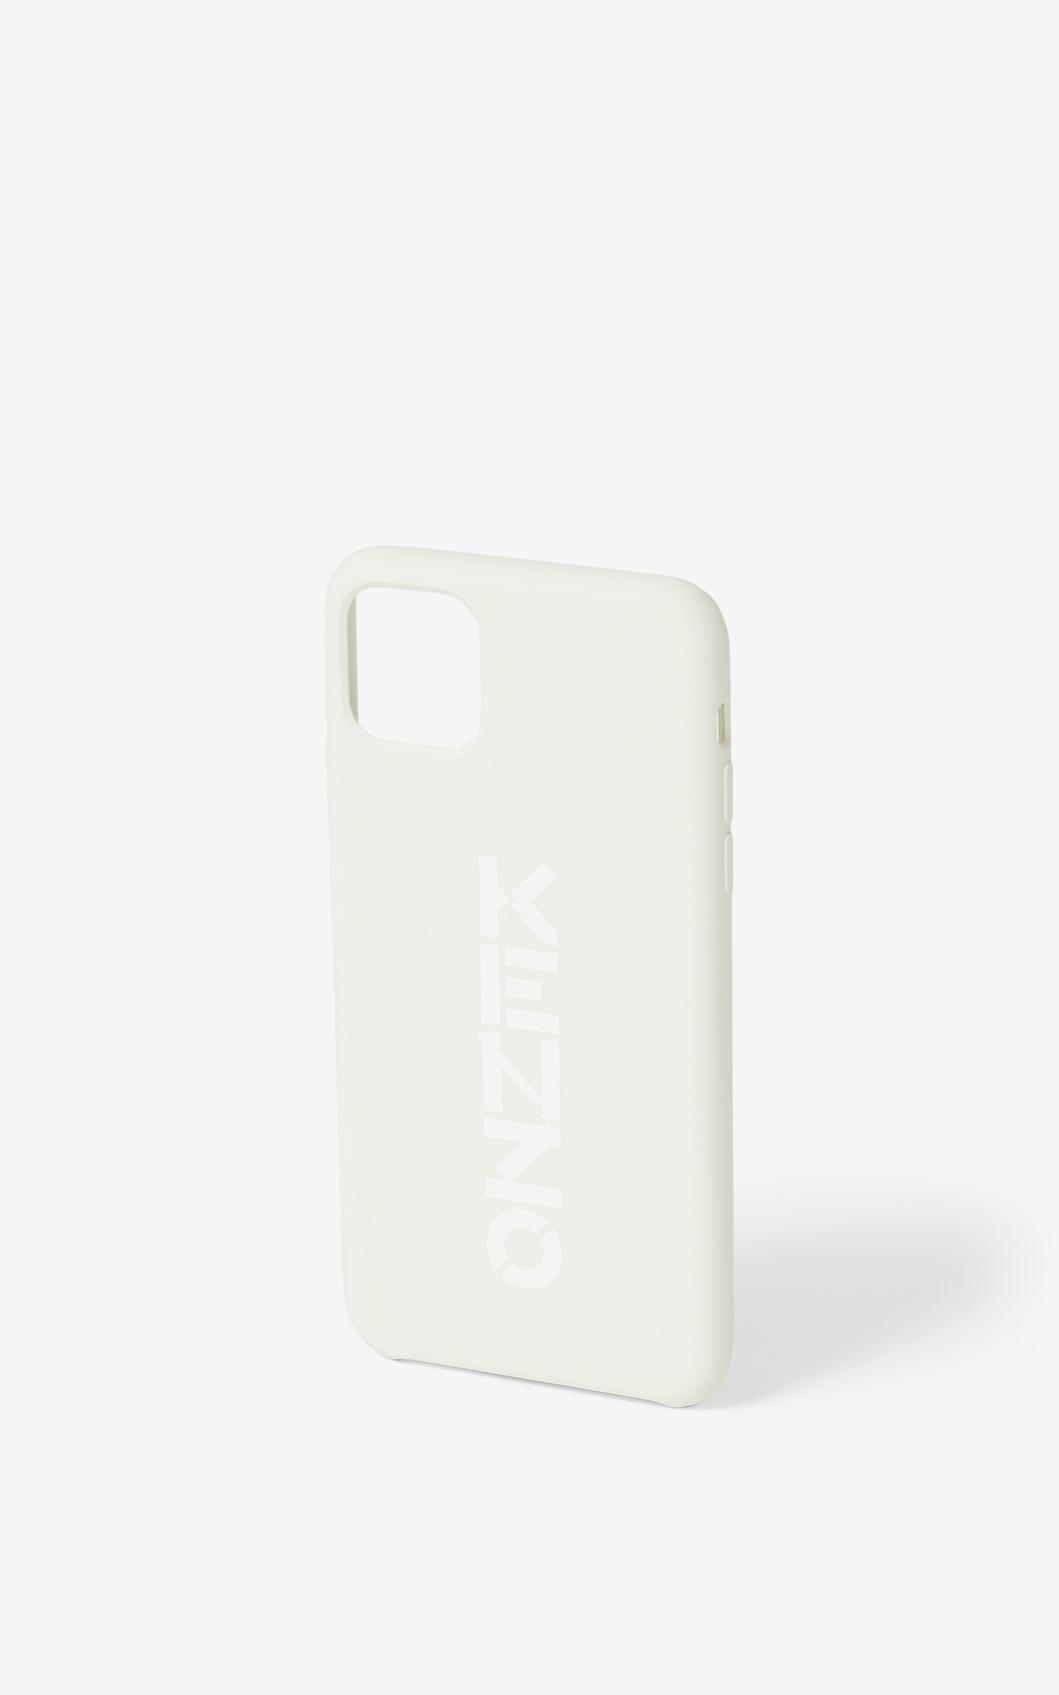 KENZO Coque iPhone XI Pro Max